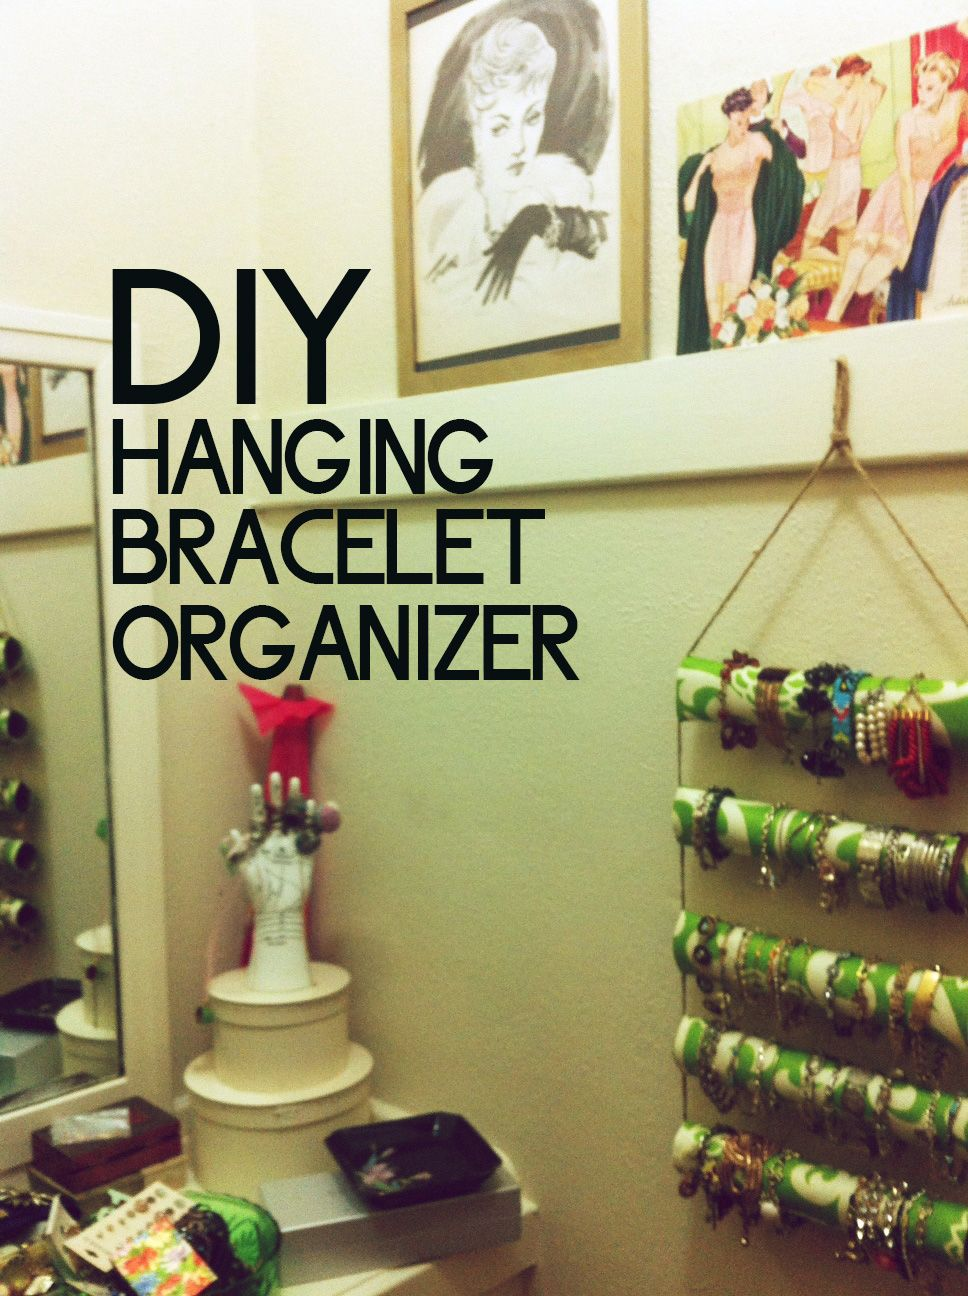 Bracelet Organizer Ideas Diy Hanging Bracelet Organizerjpg 9681296 Pixels Storage